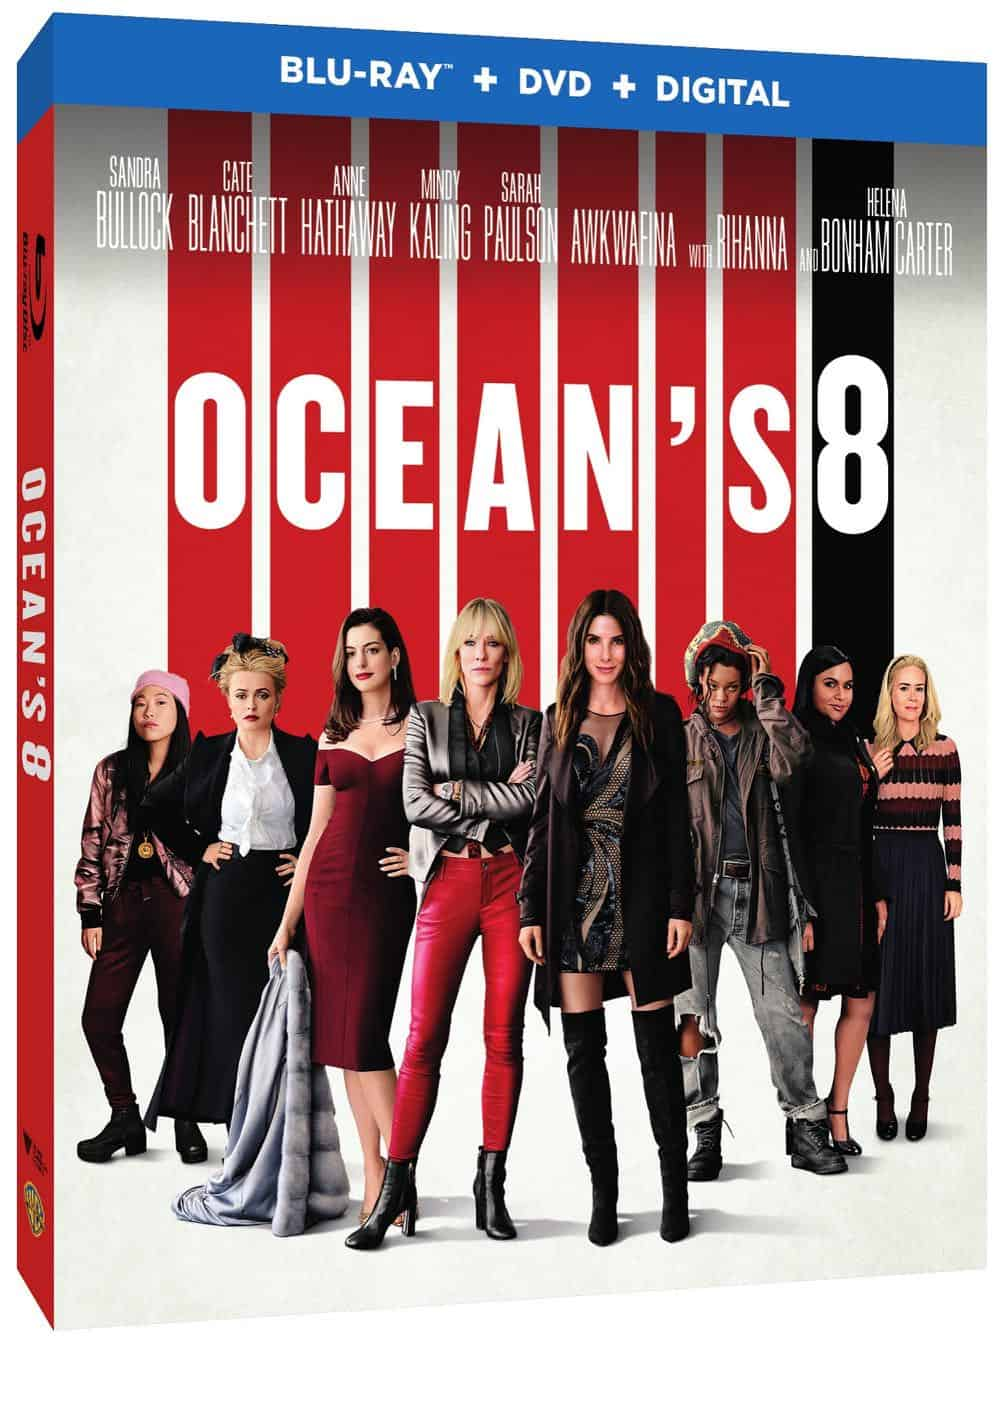 Oceans 8 Bluray DVD Digital 2